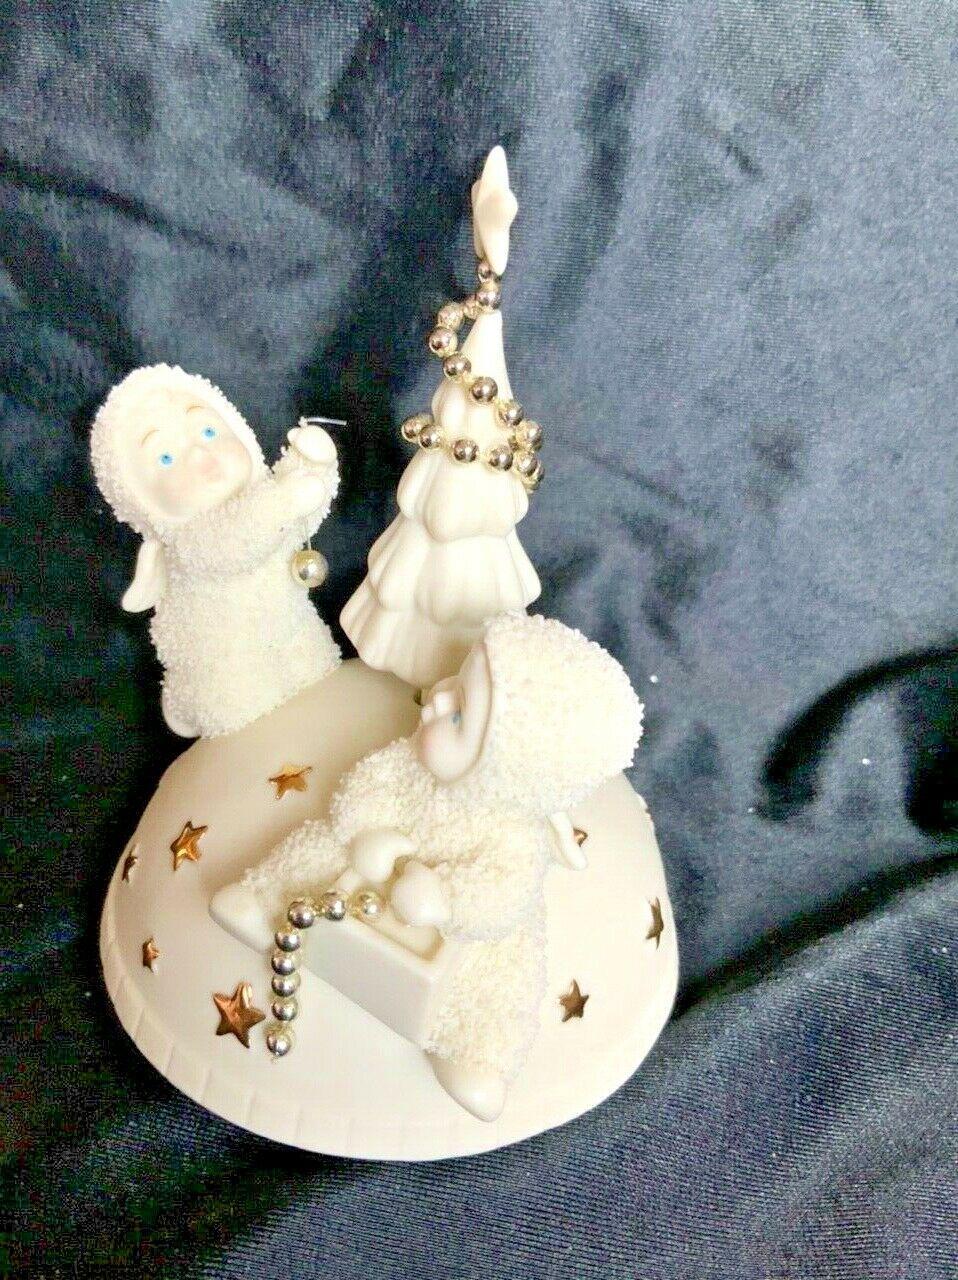 "Department 56 Snowbabies Revolving Music Box Trimming The Tree ""O""Tannenbaum"" - $24.99"